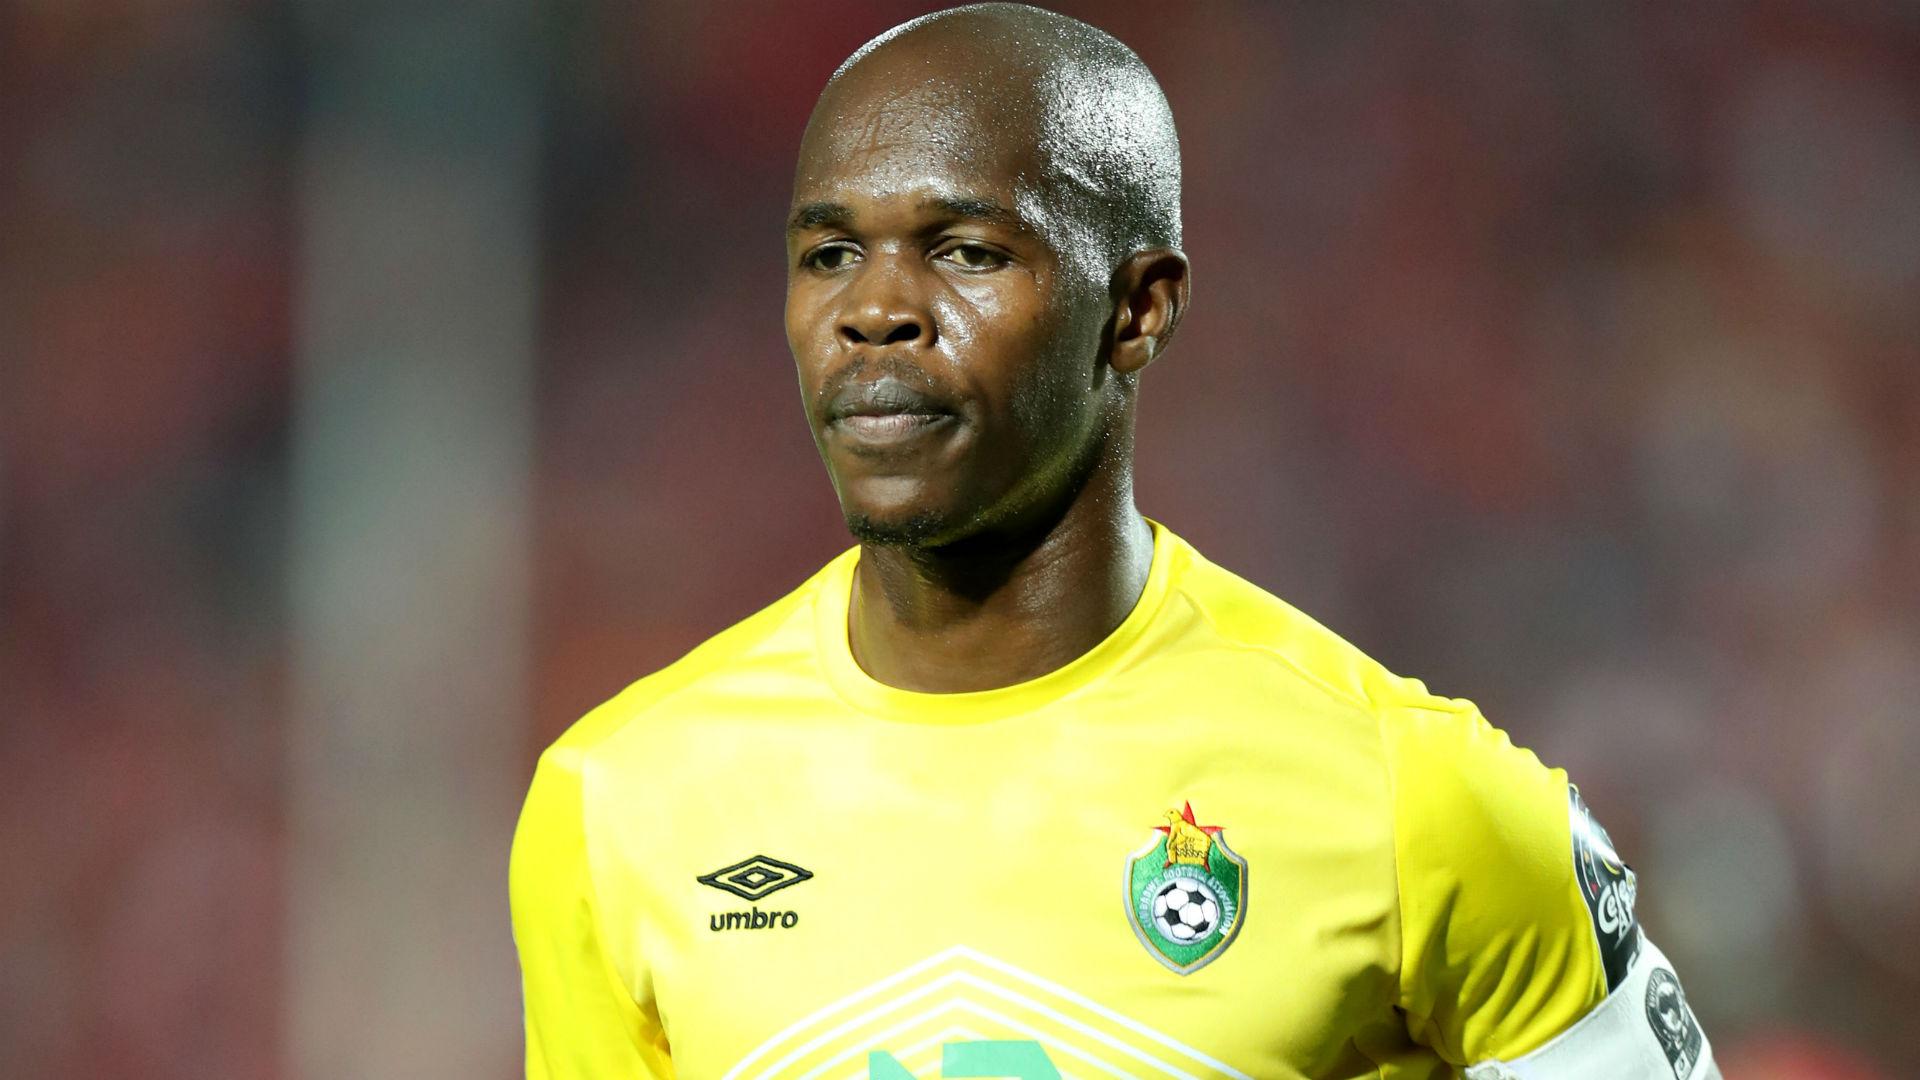 Mamelodi Sundowns target Musona scores on AS Eupen debut